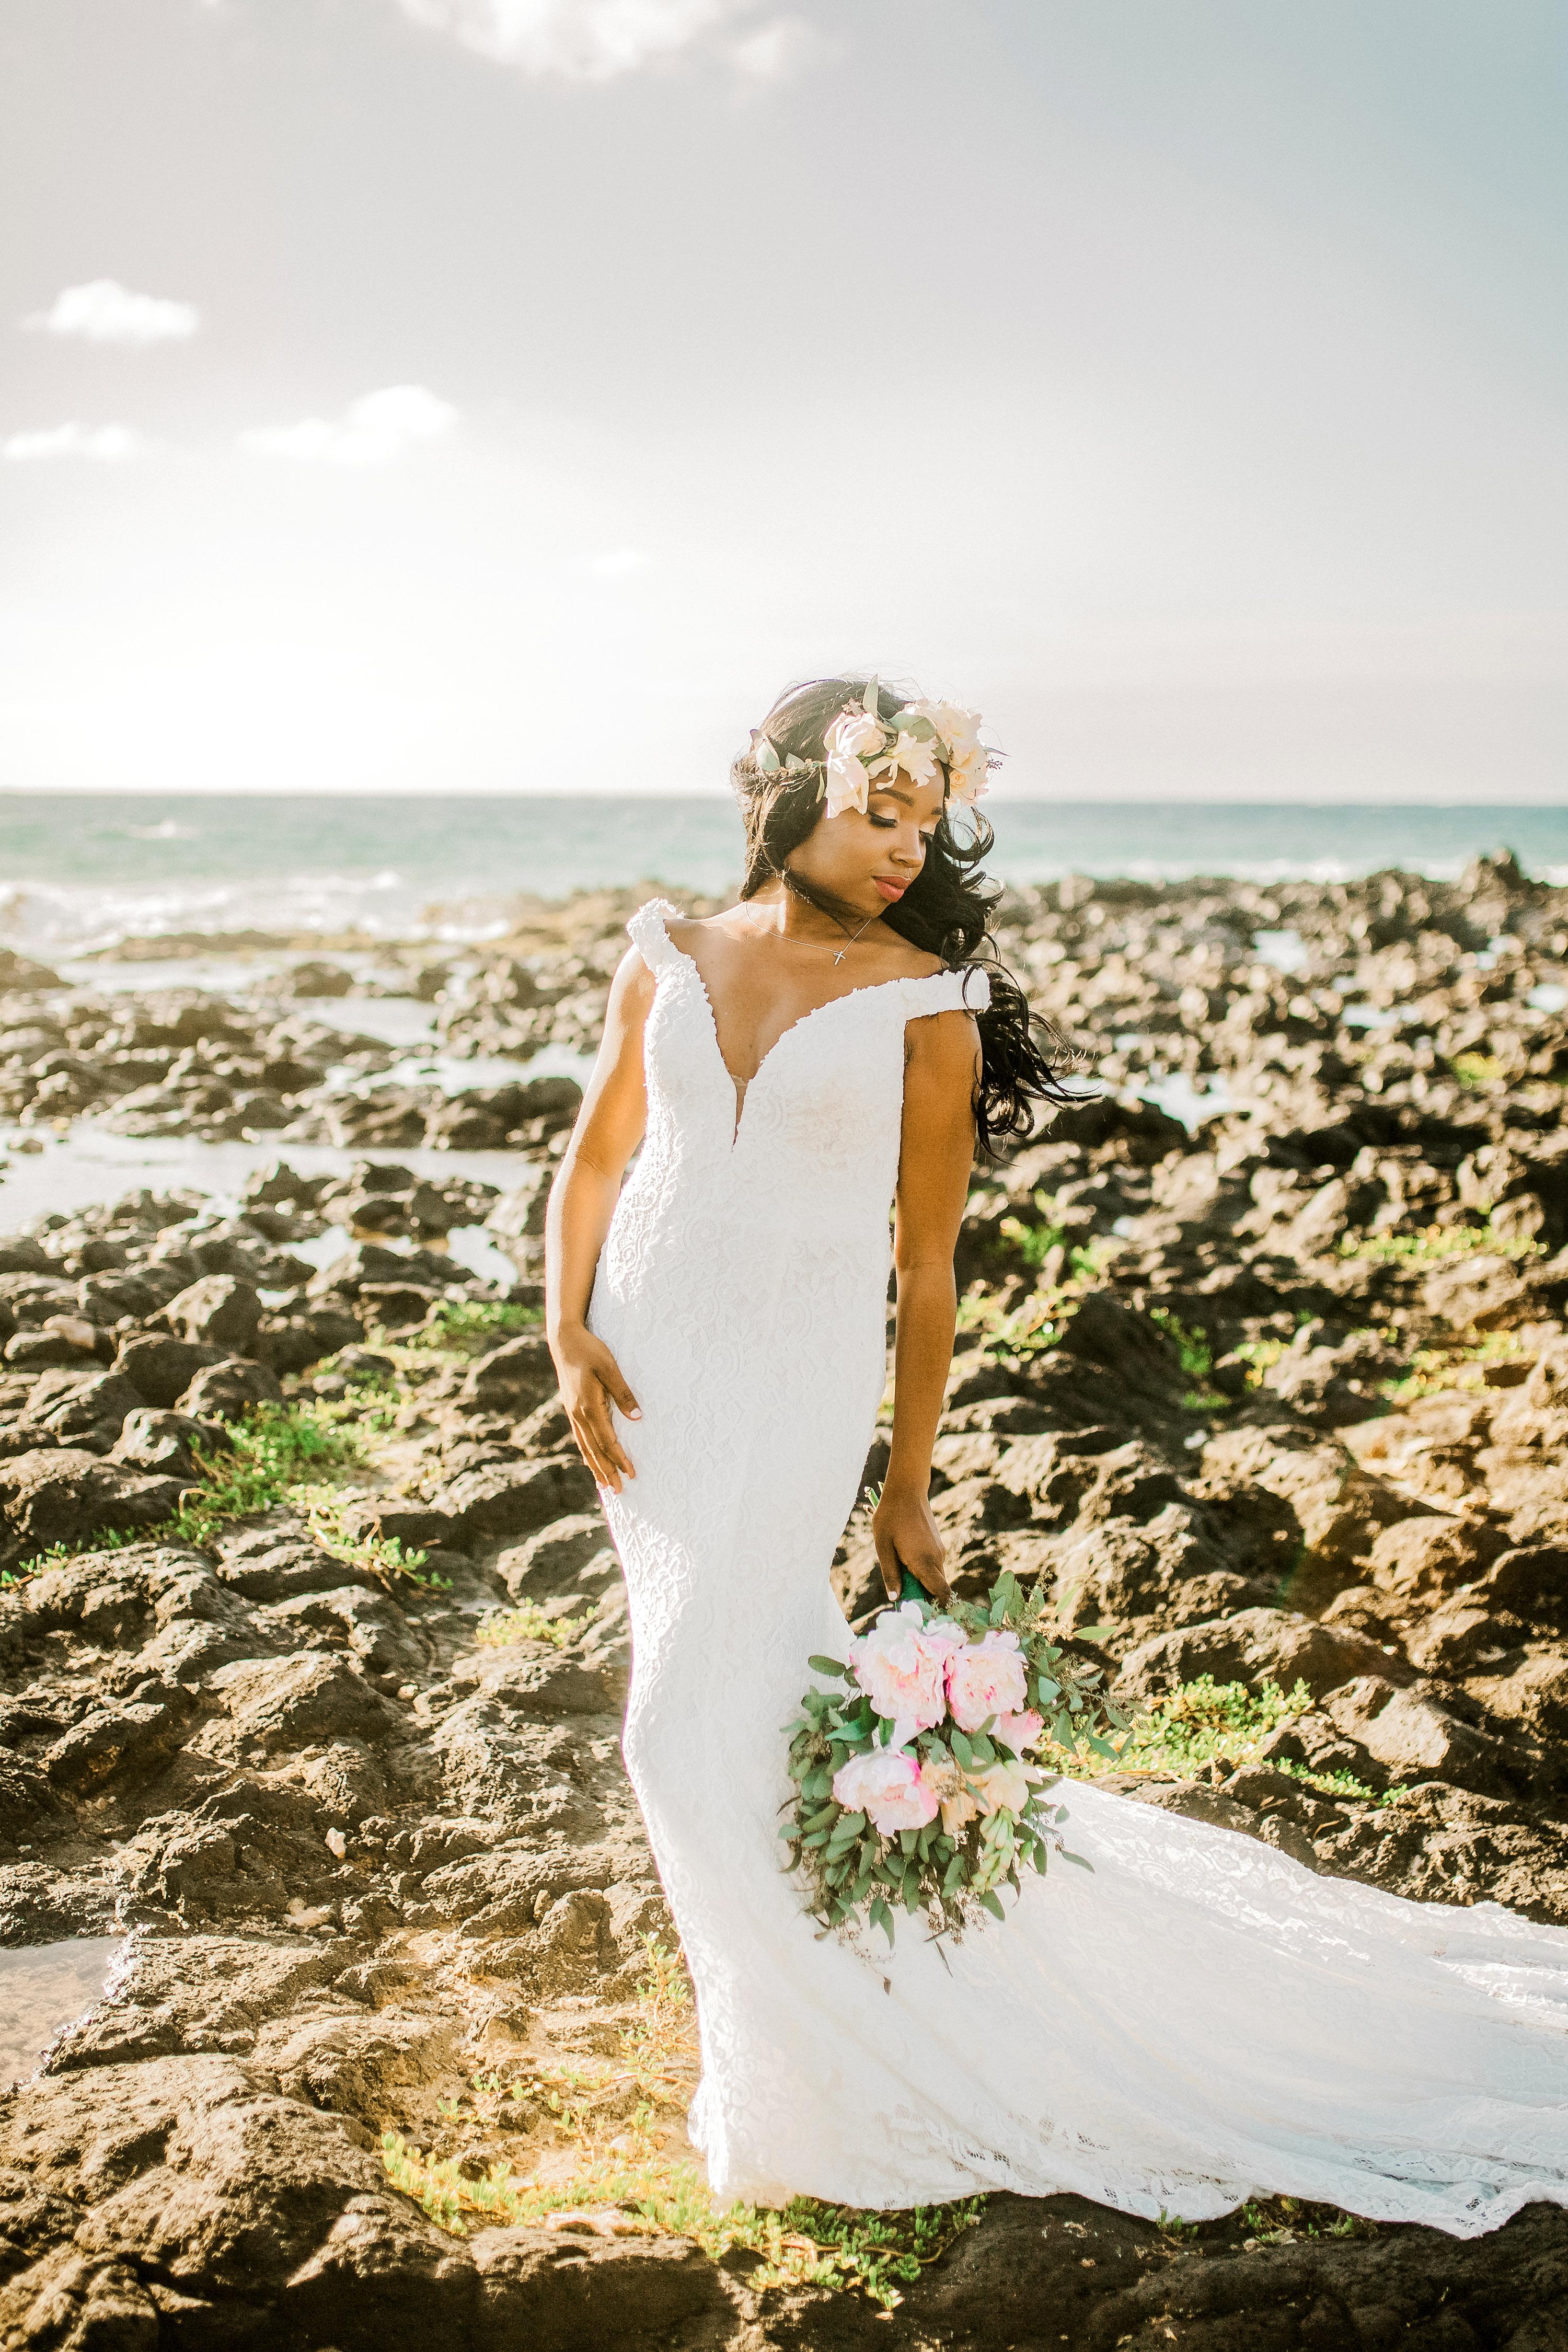 20 Wedding Dresses Perfect for Destination Nuptials